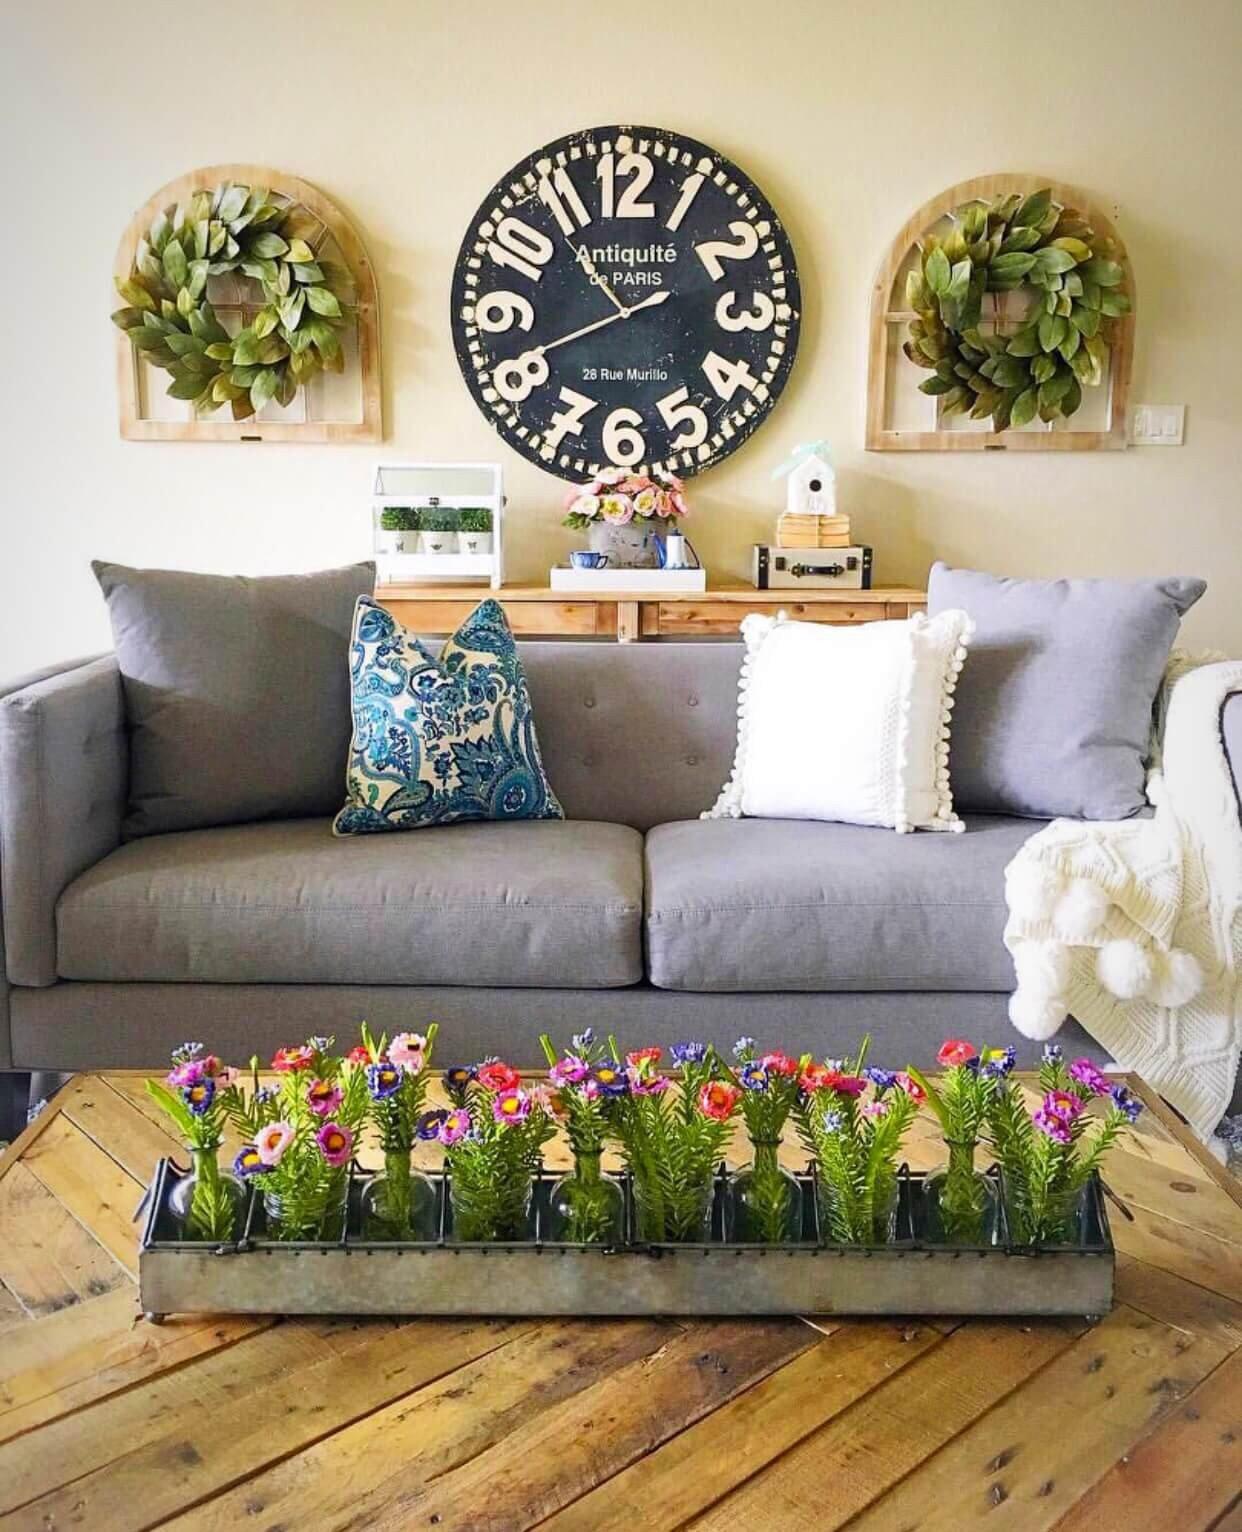 Living Room Wall Decor Ideas Inspirational 33 Best Rustic Living Room Wall Decor Ideas and Designs